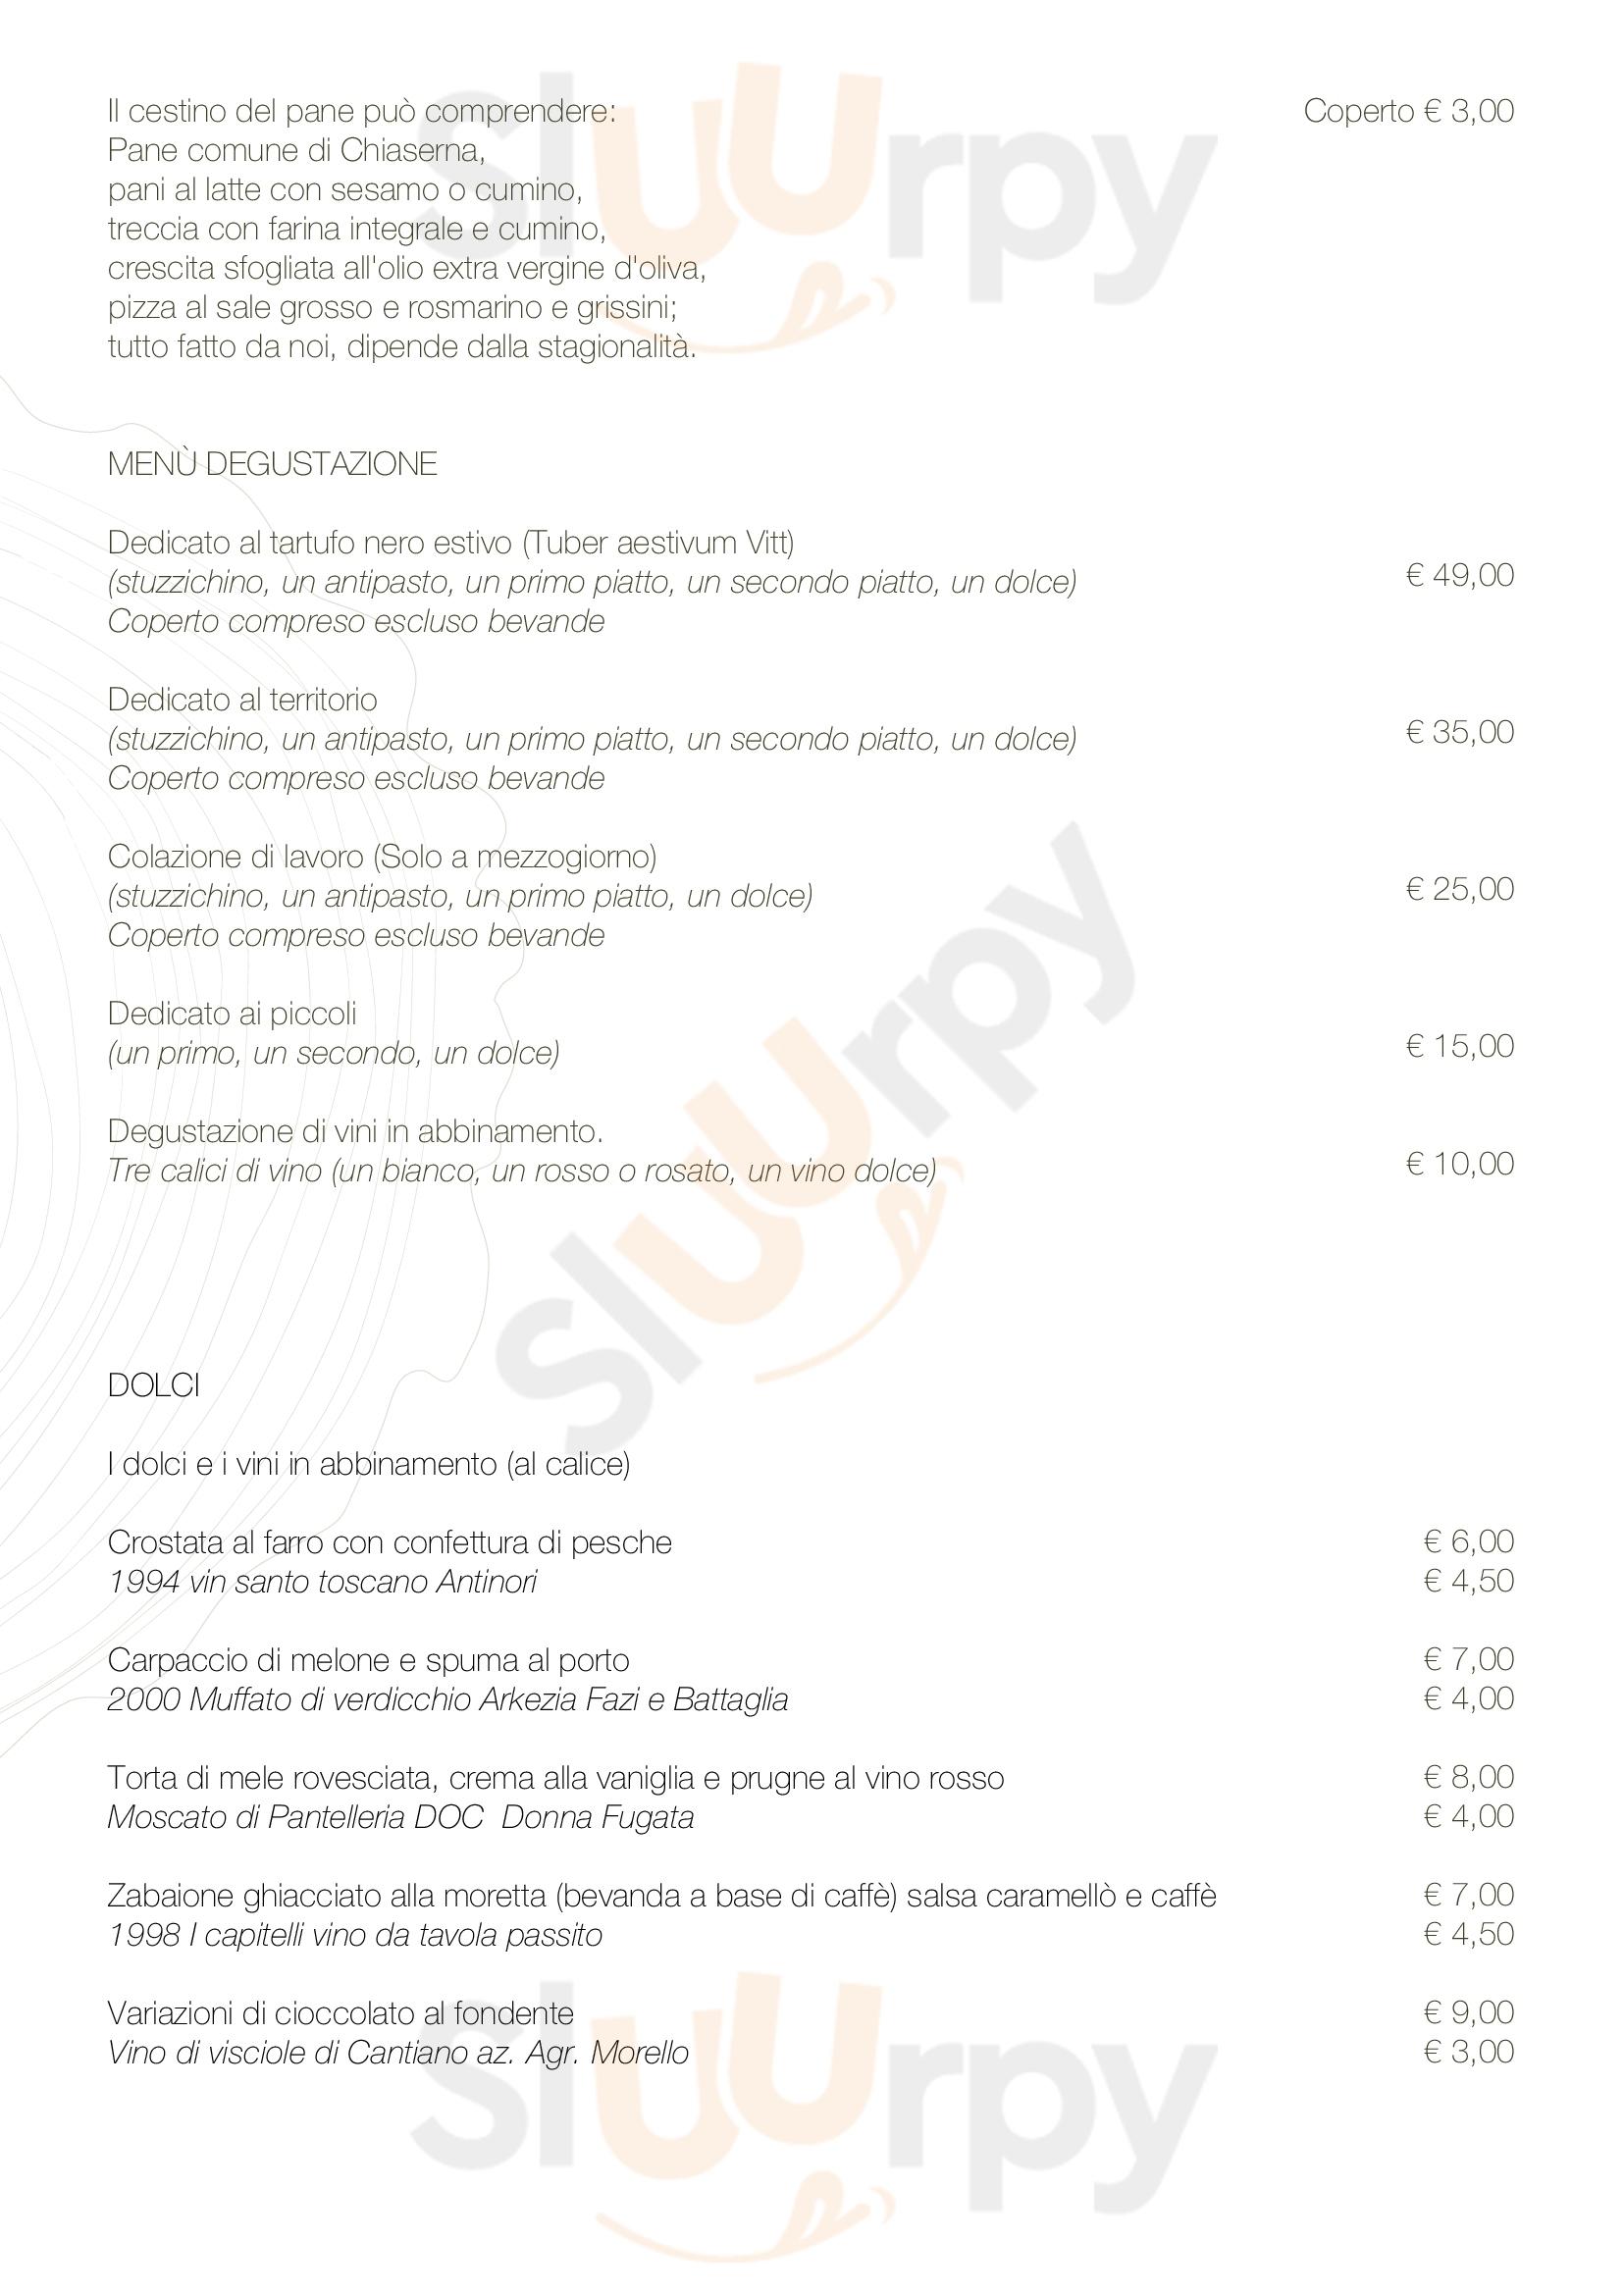 Anticofurlo Acqualagna menù 1 pagina